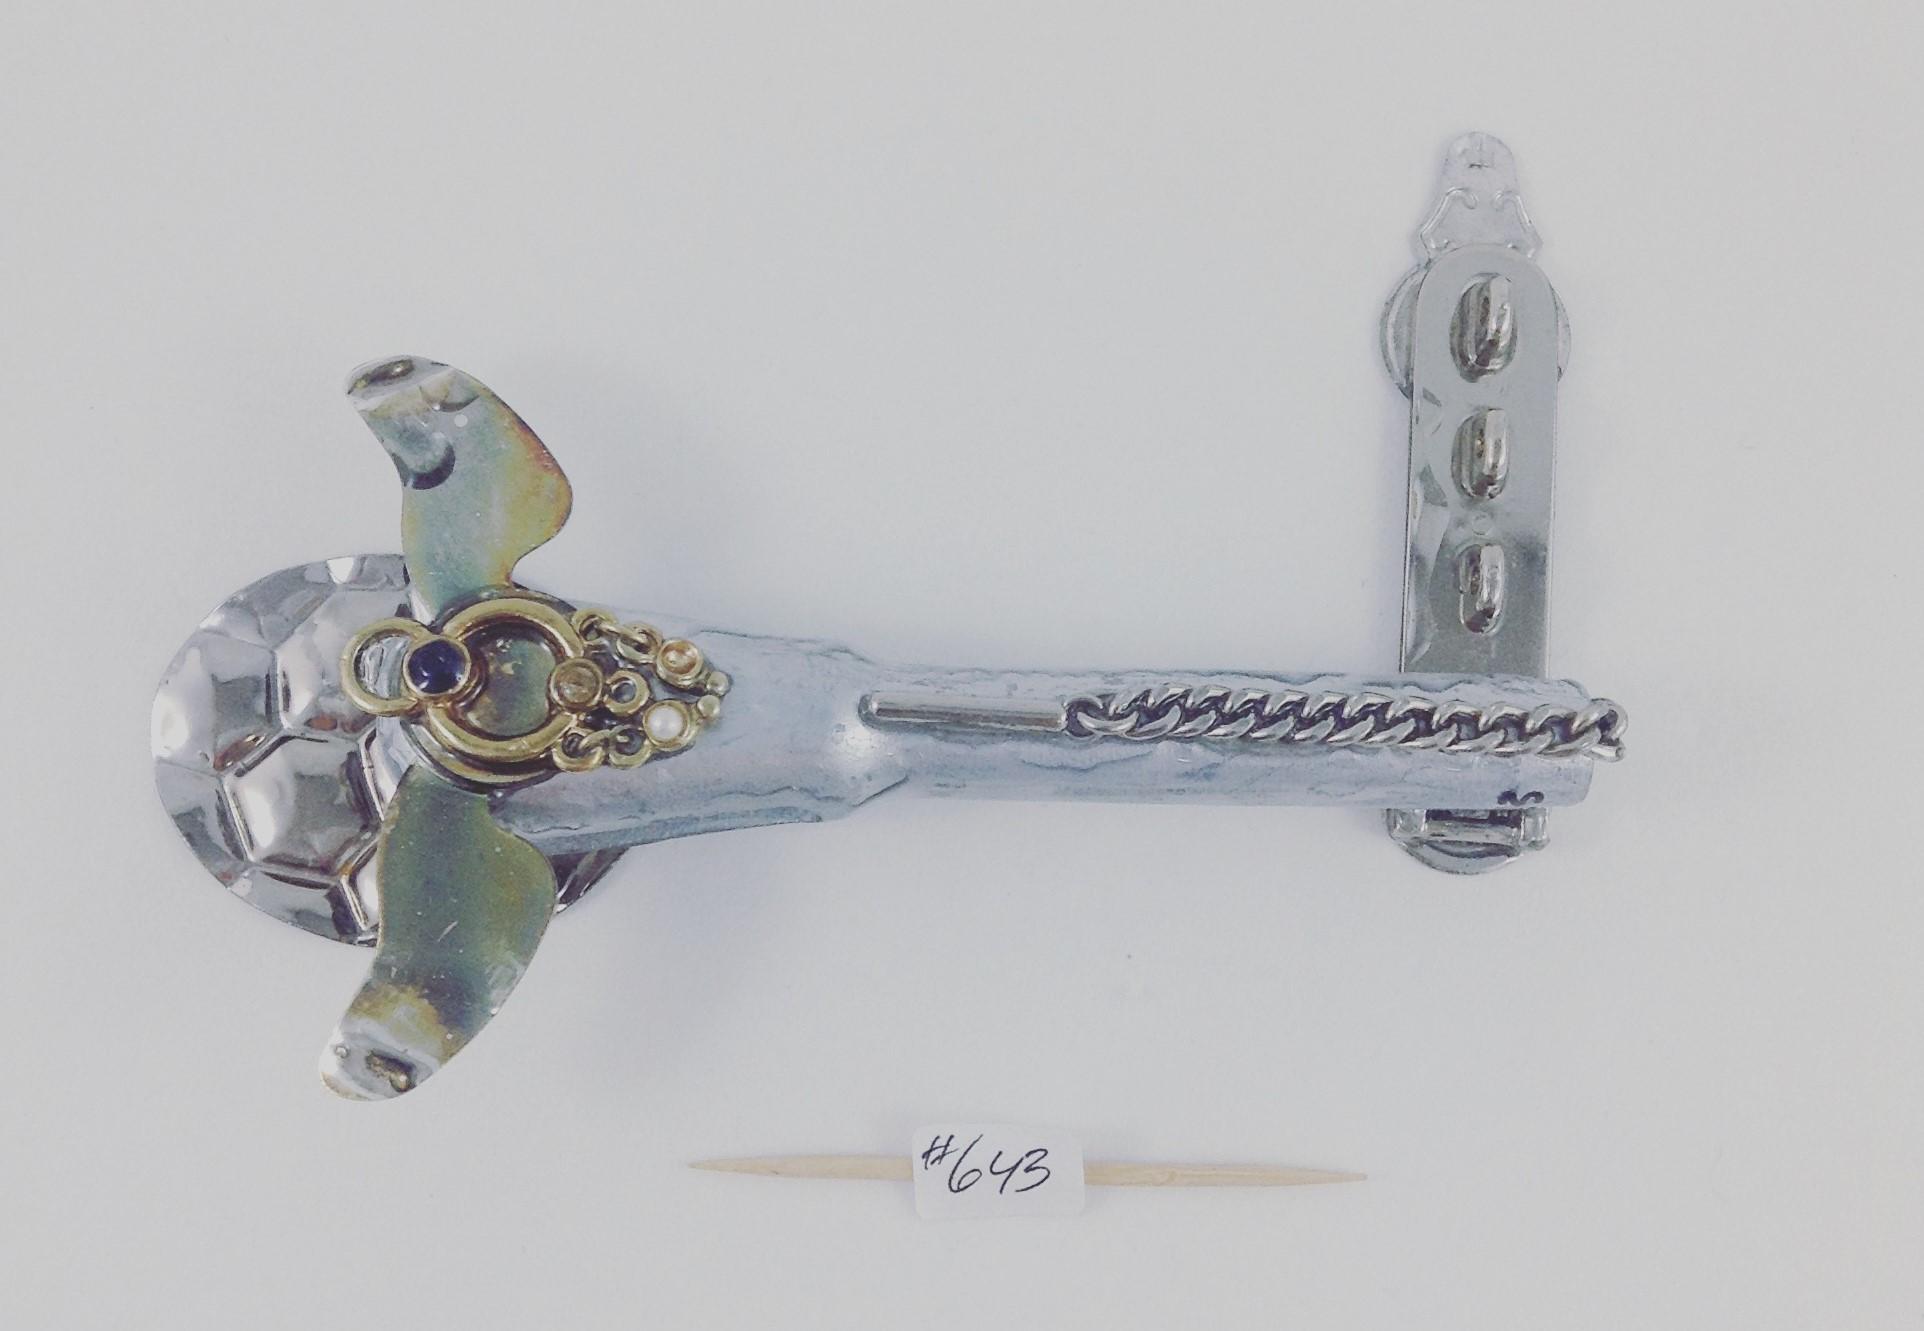 Key 643 other side